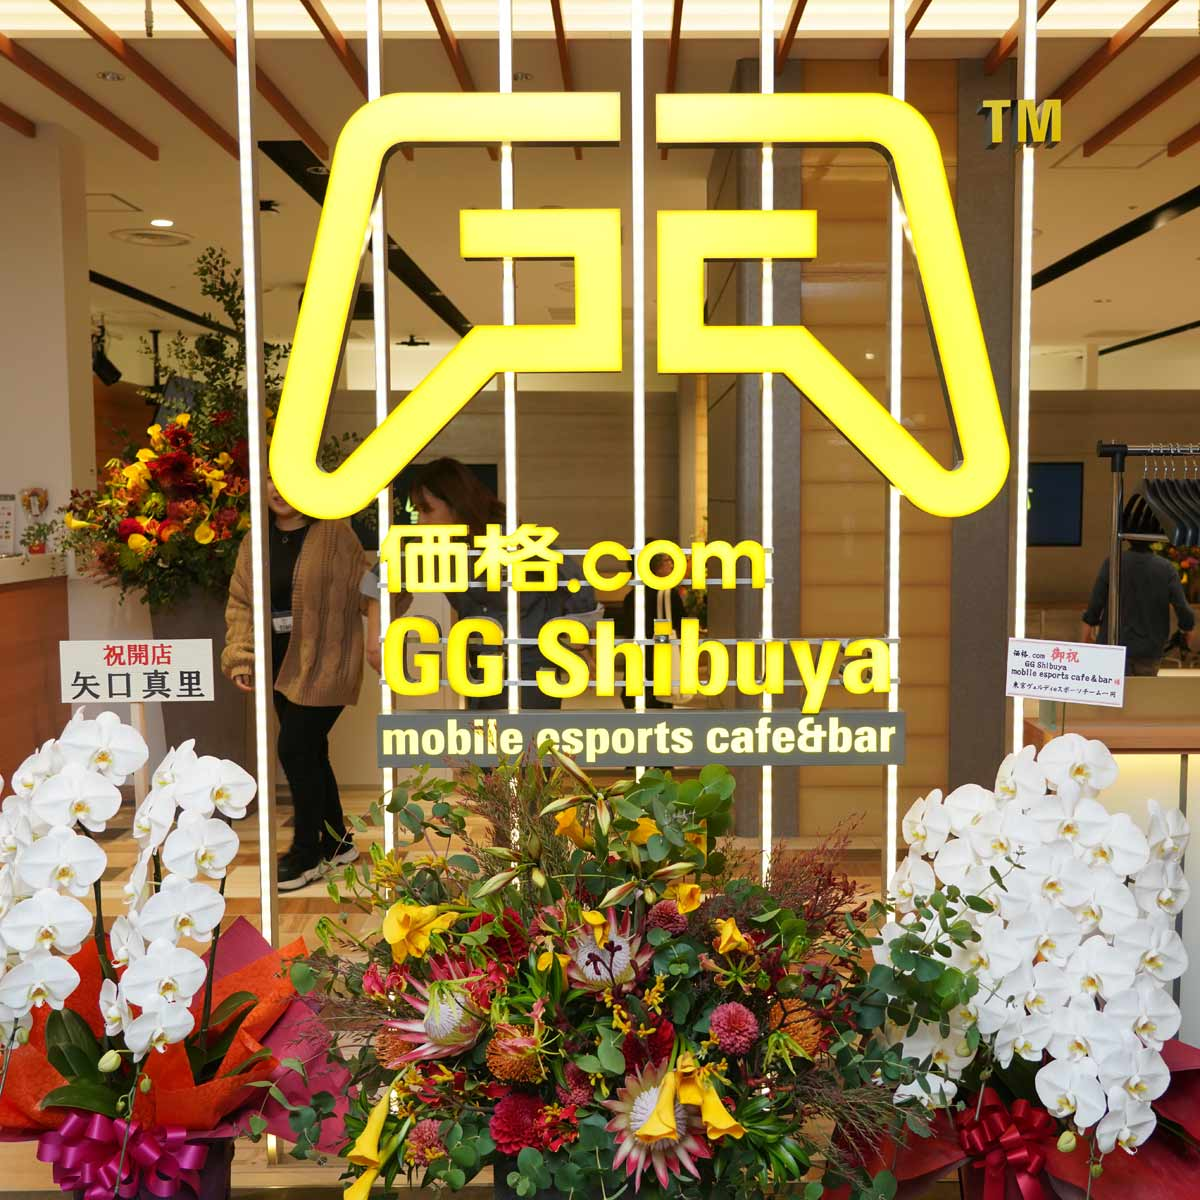 eスポーツの大型観覧カフェ「価格.com GG Shibuya Mobile esports cafe&bar」が渋谷PARCOにオープン